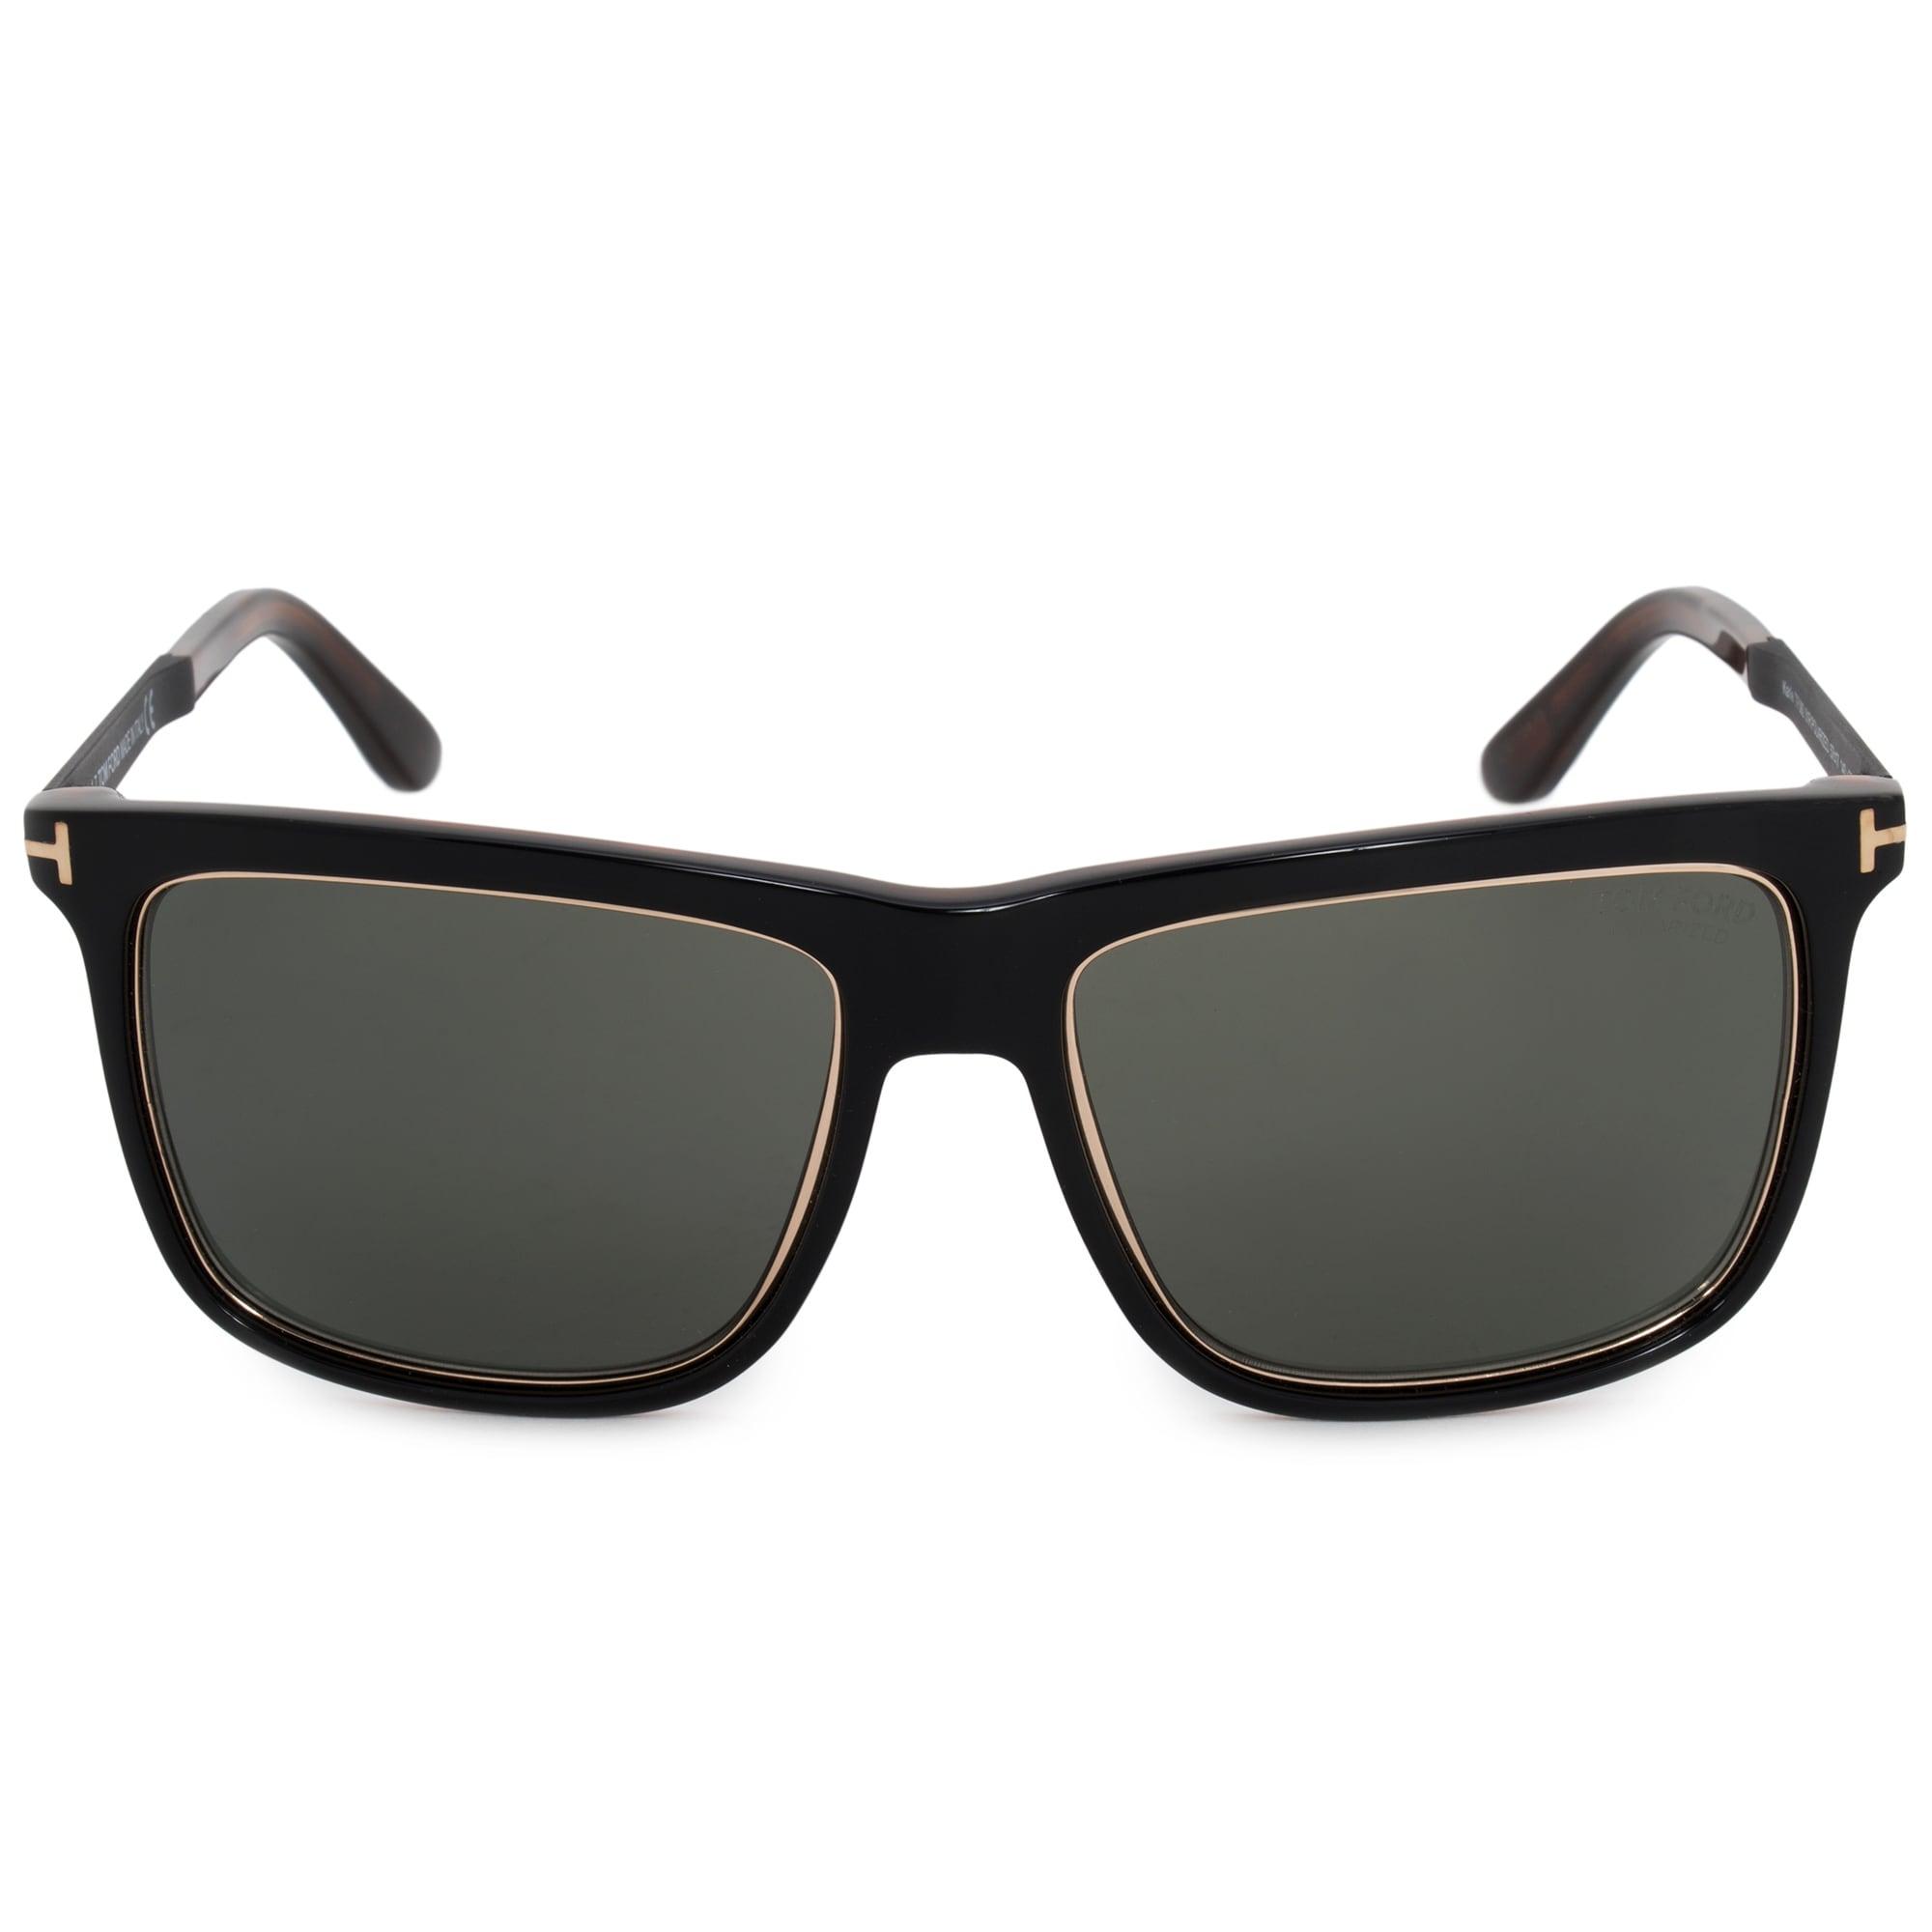 2ca1369fbd5cd Shop Tom Ford Karlie Square Sunglasses FT0392 F 01R 57 - On Sale ...